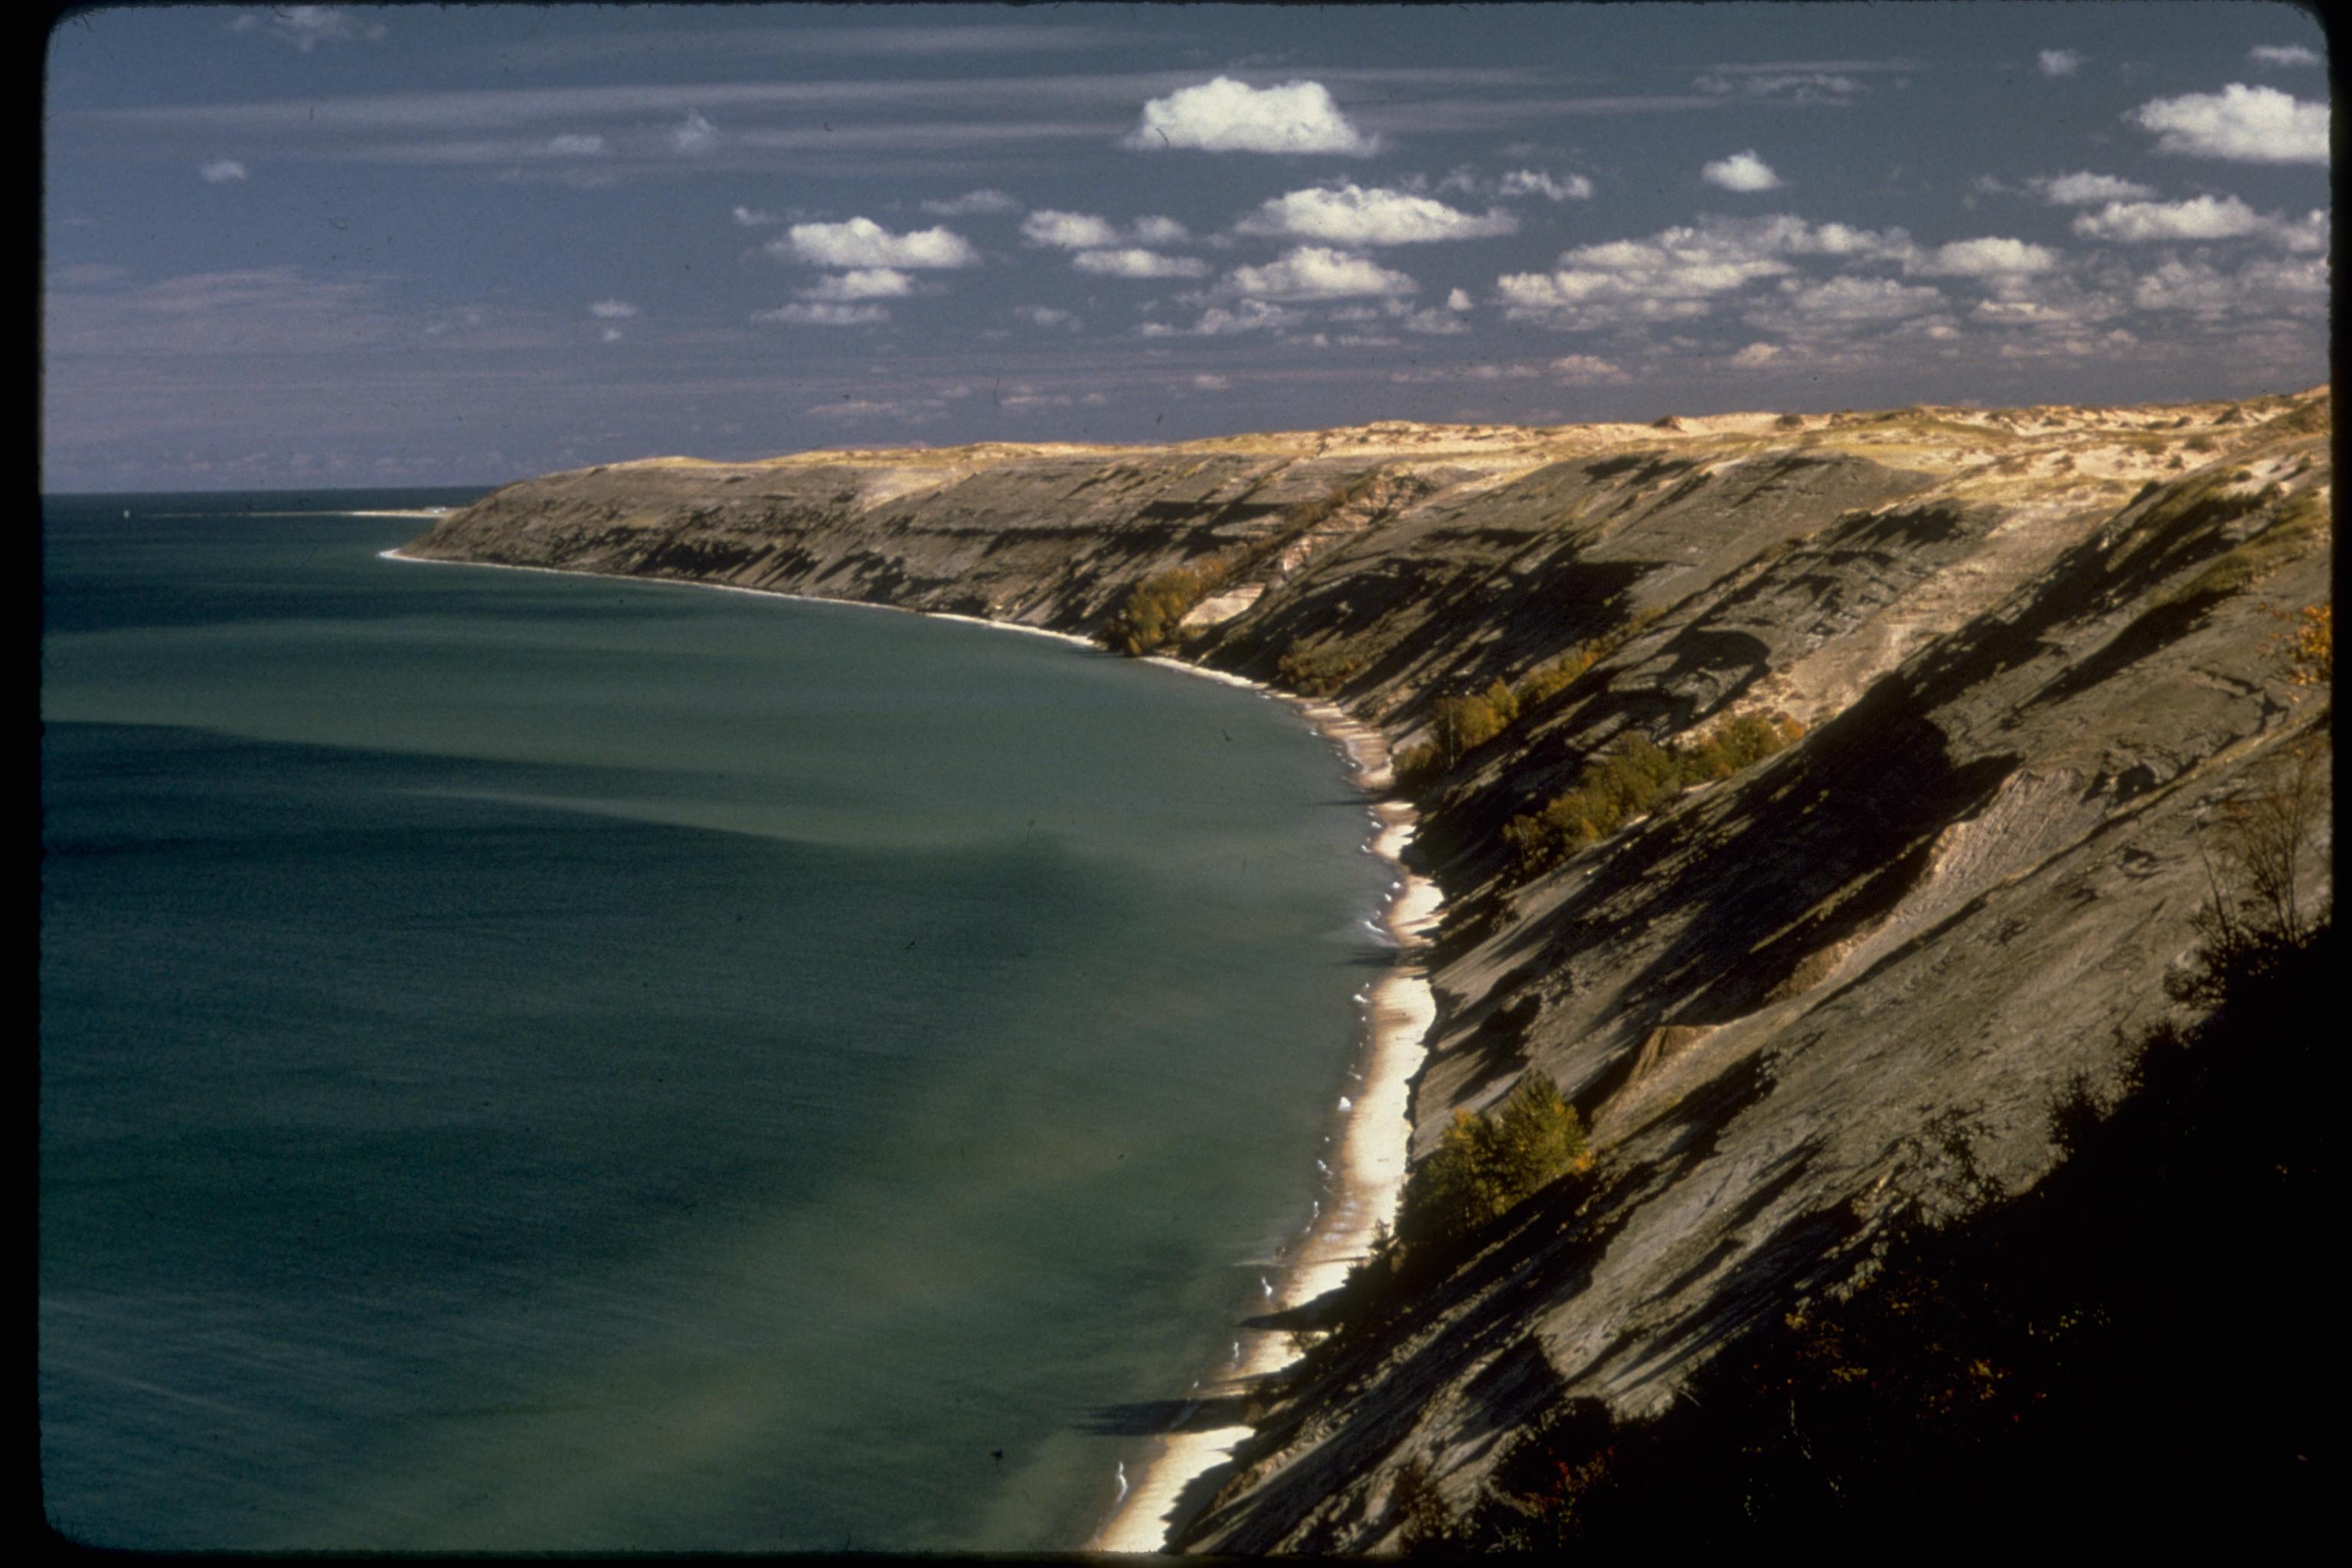 File Pictured Rocks National Lakeshore Piro0725 Jpg